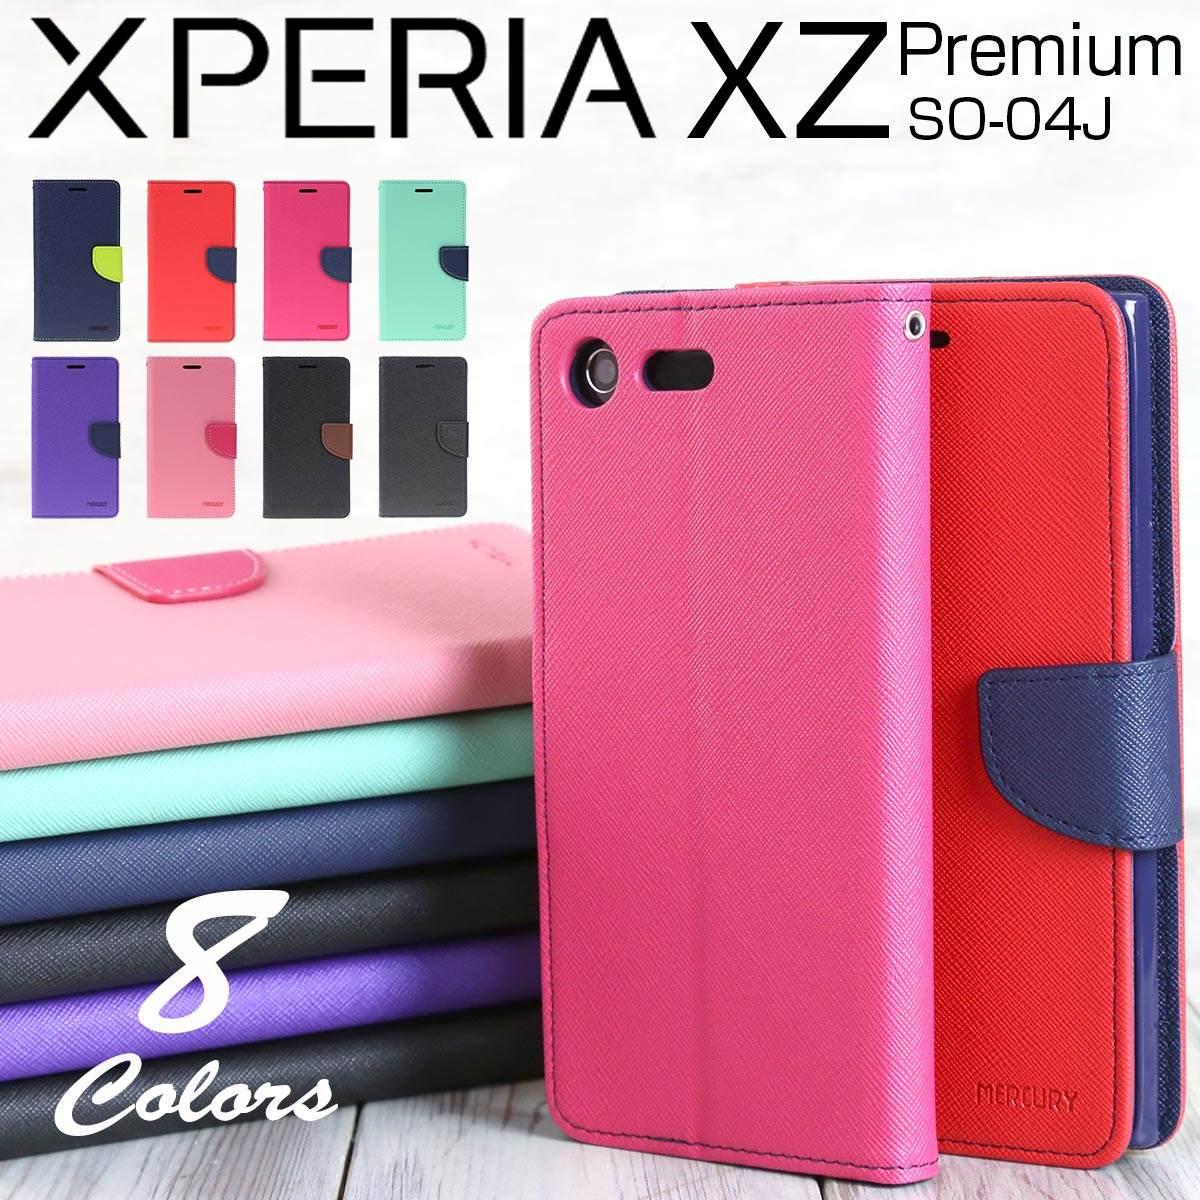 Xperia XZ Premium SO-04J コンビネーションカラー手帳型ケース | 手帳ケース 携帯ケース 手帳型 手帳型ケース ケータイケース スマホカバー エクスペリア スマフォケース レザー レザーケース ケース スマホケース 携帯カバー モバイルカバー カバー 携帯 モバイルケース